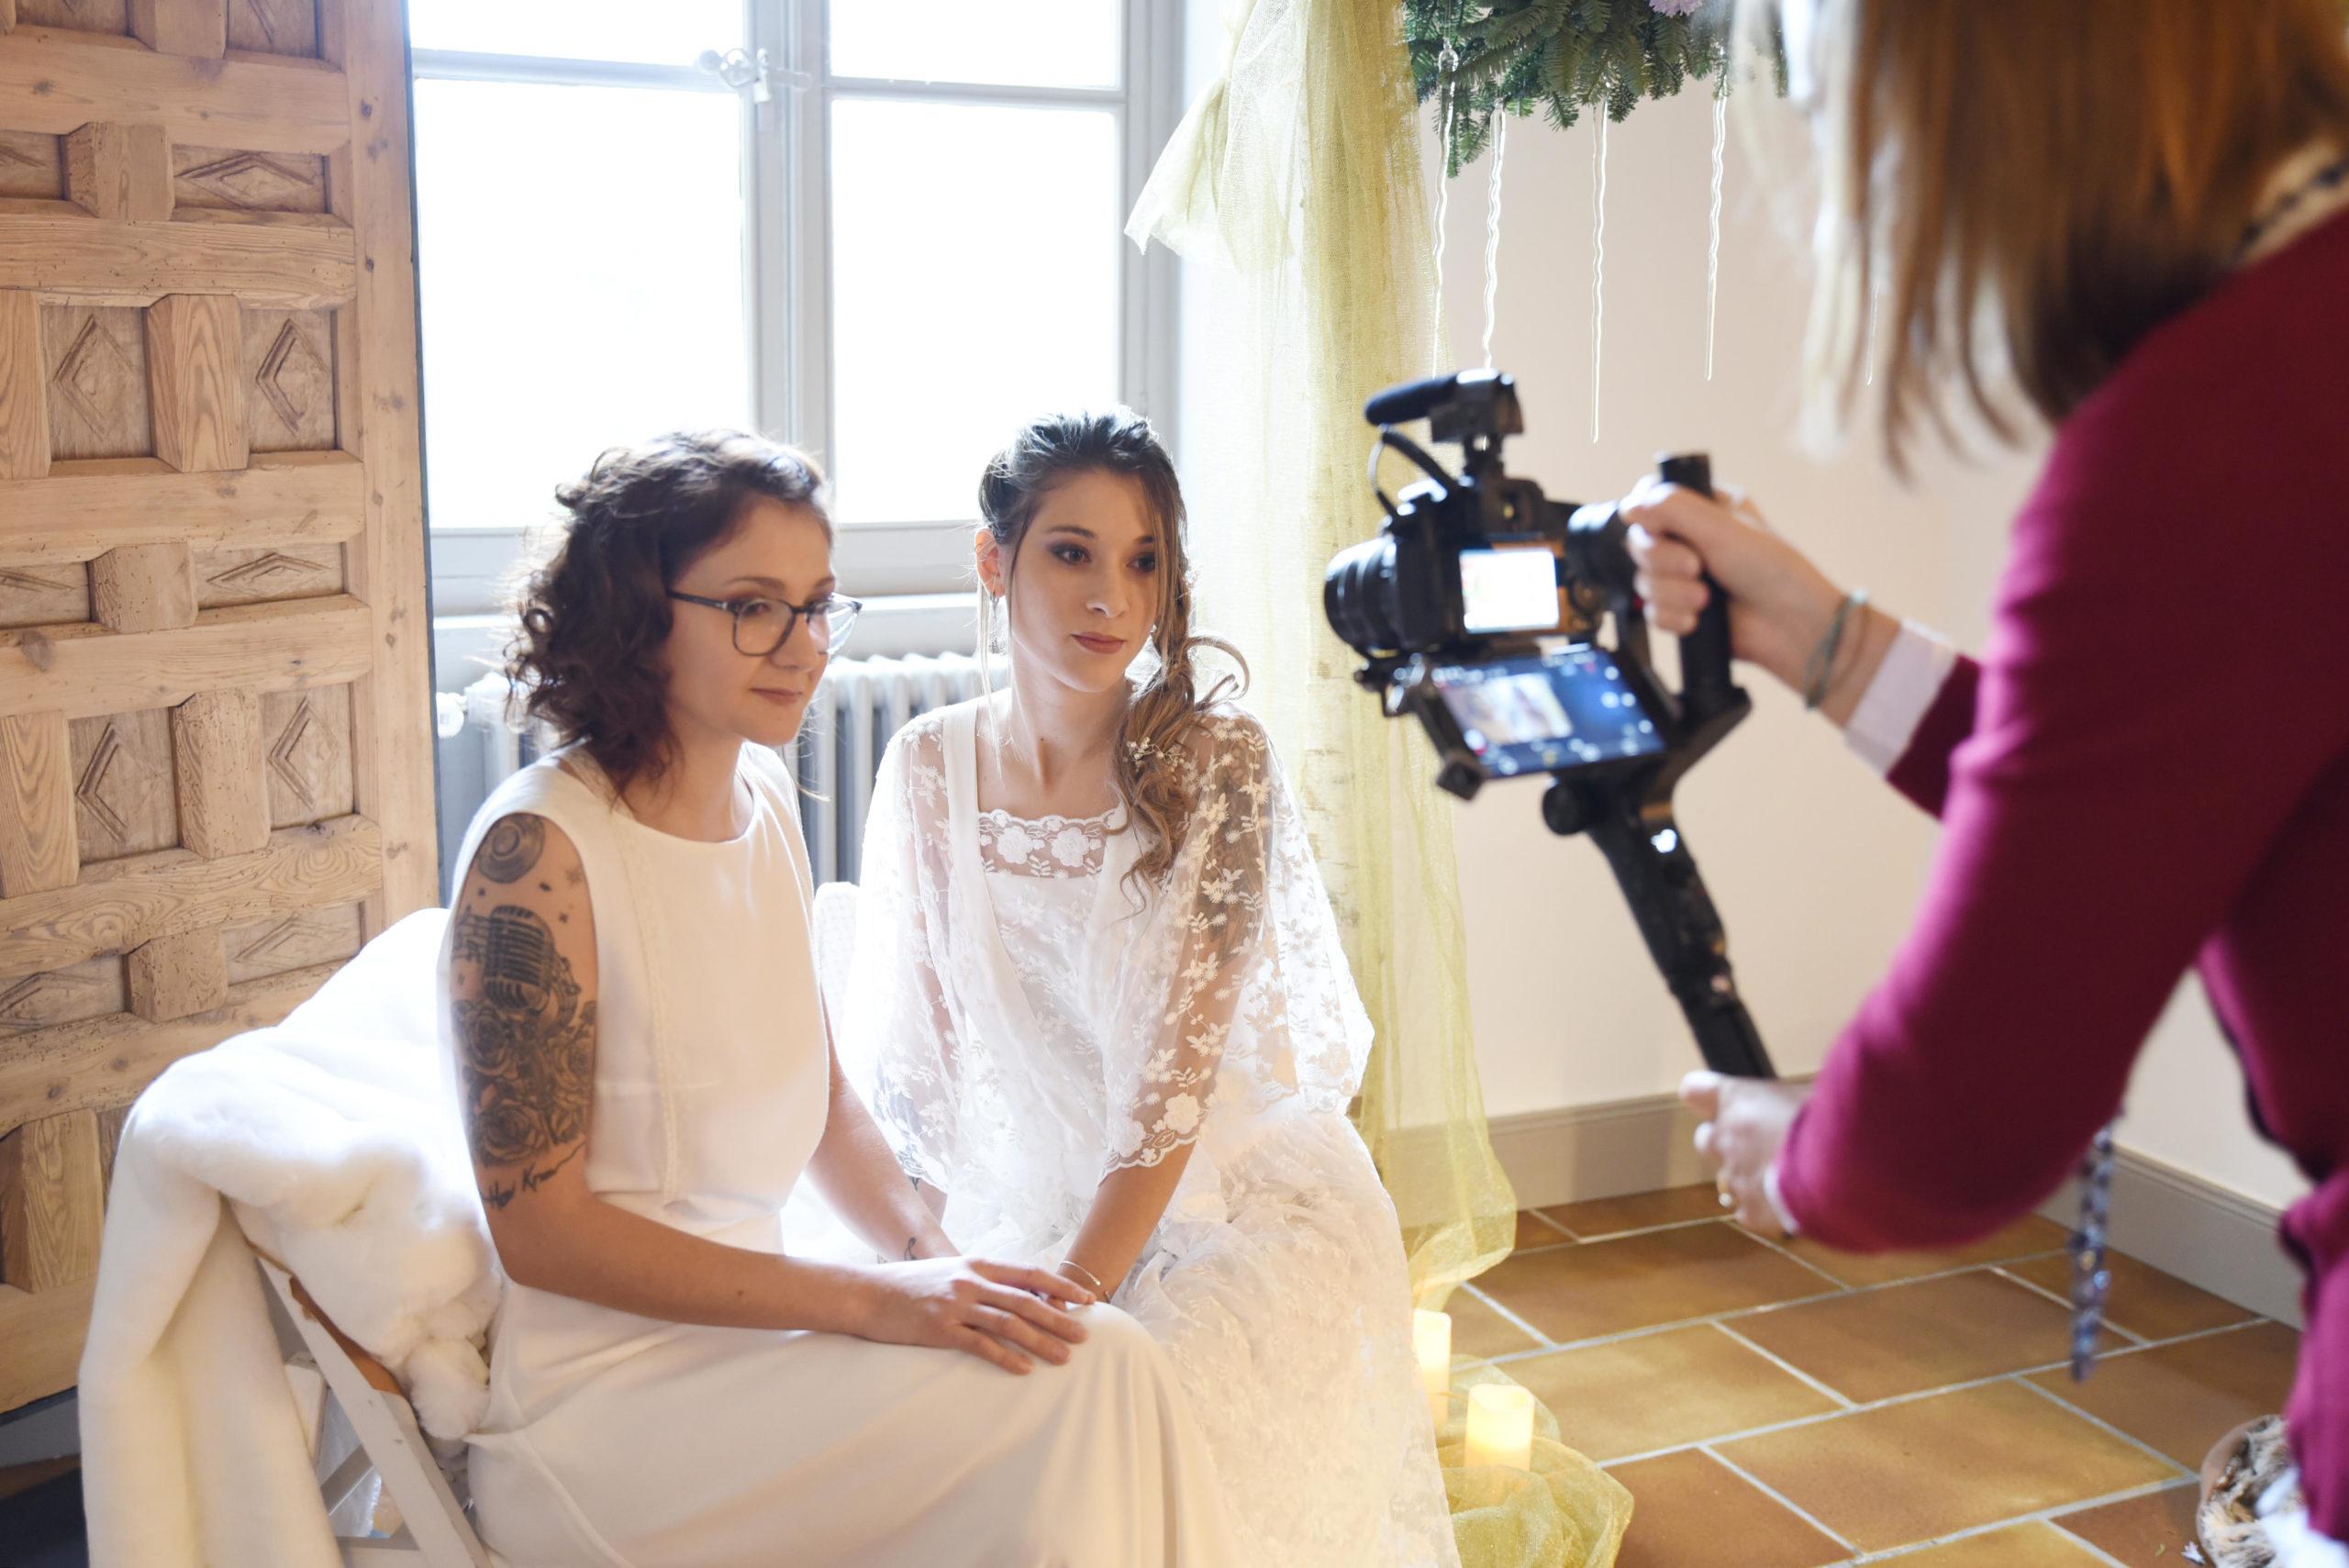 omniviewprod-mariage-teaser